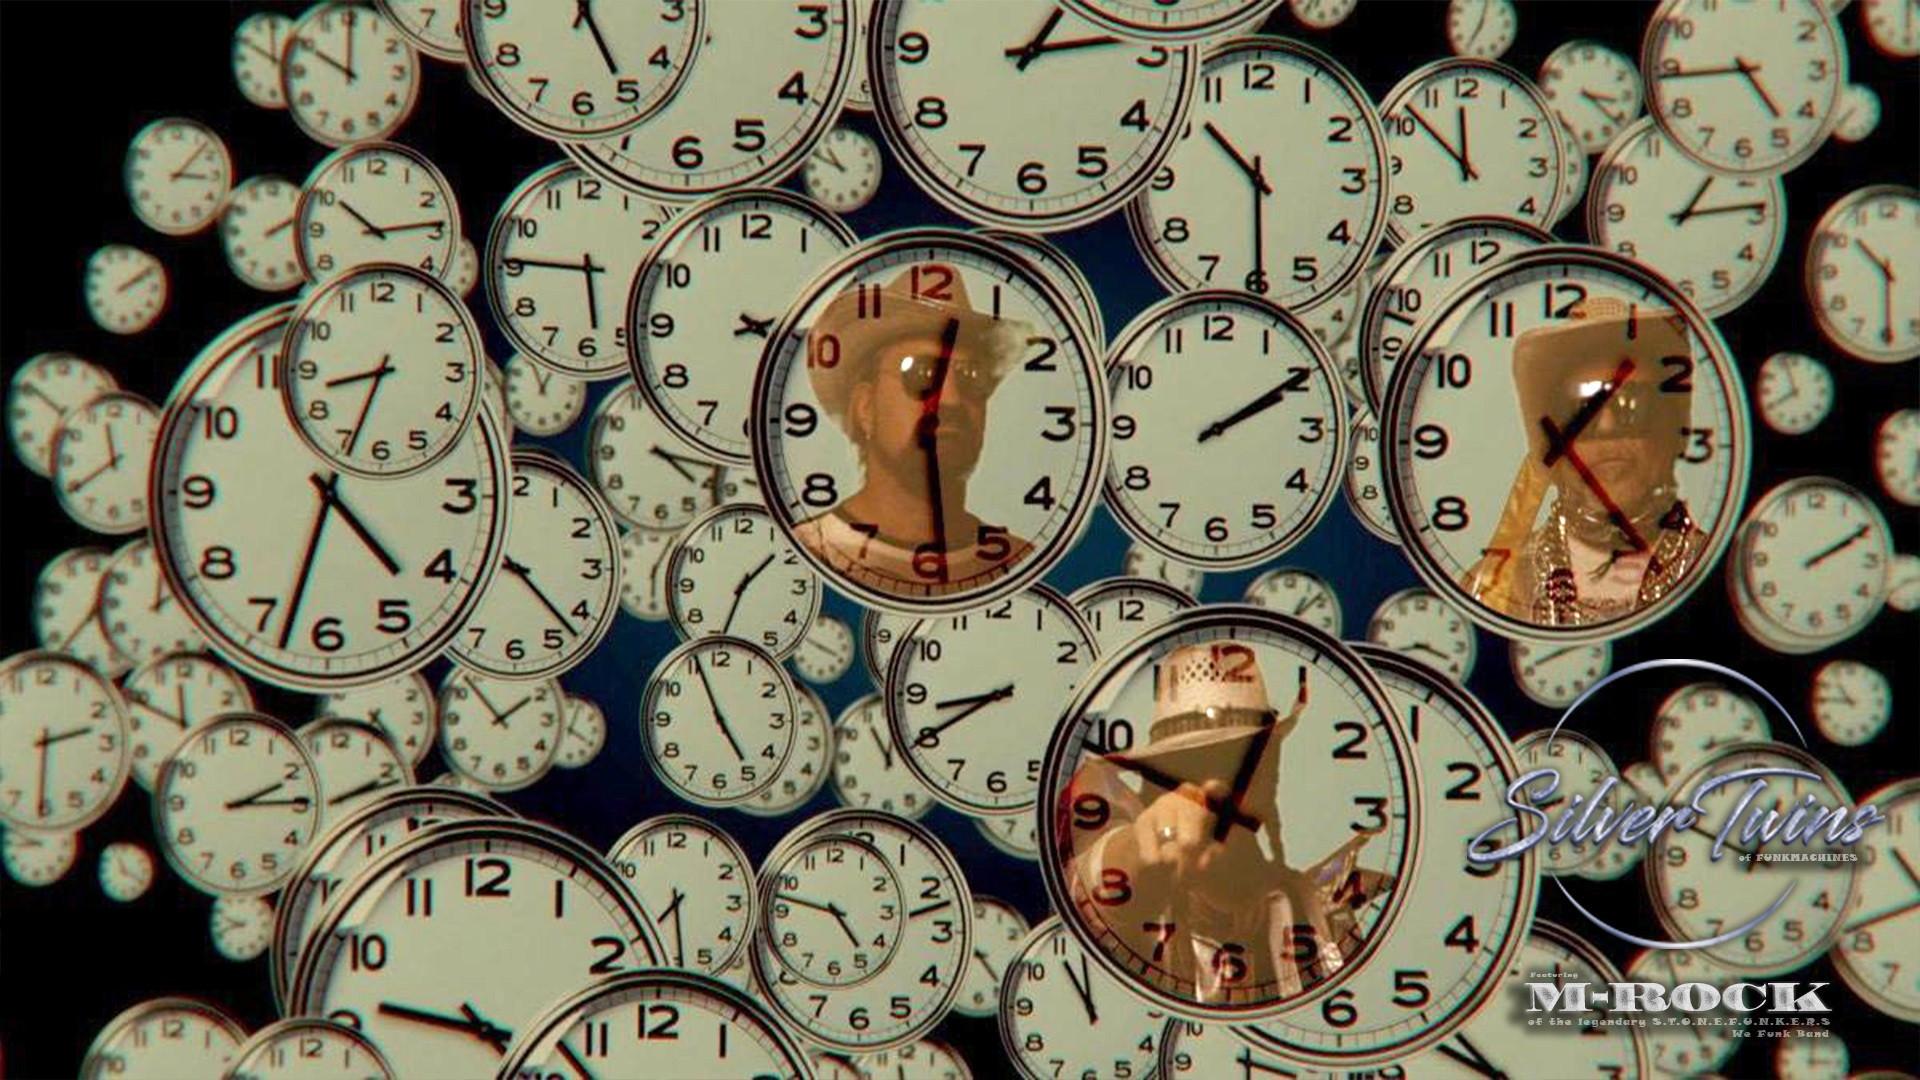 Time SilverTwins of funk alla I KLOCKOE.